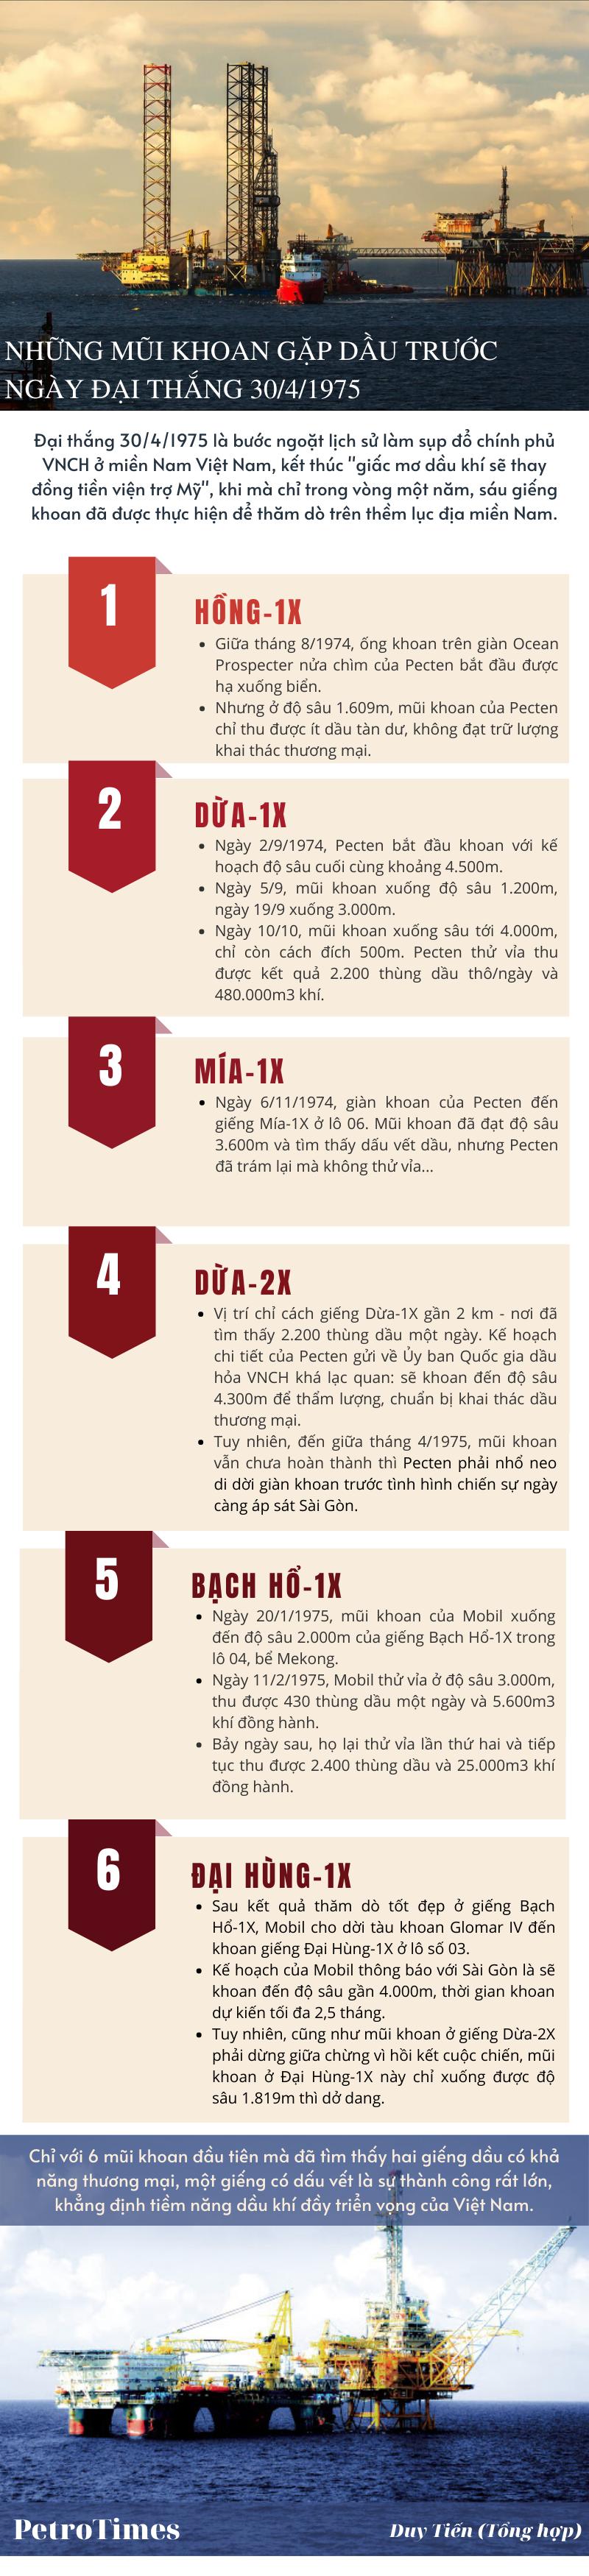 infographic nhung mui khoan gap dau truoc ngay dai thang 3041975